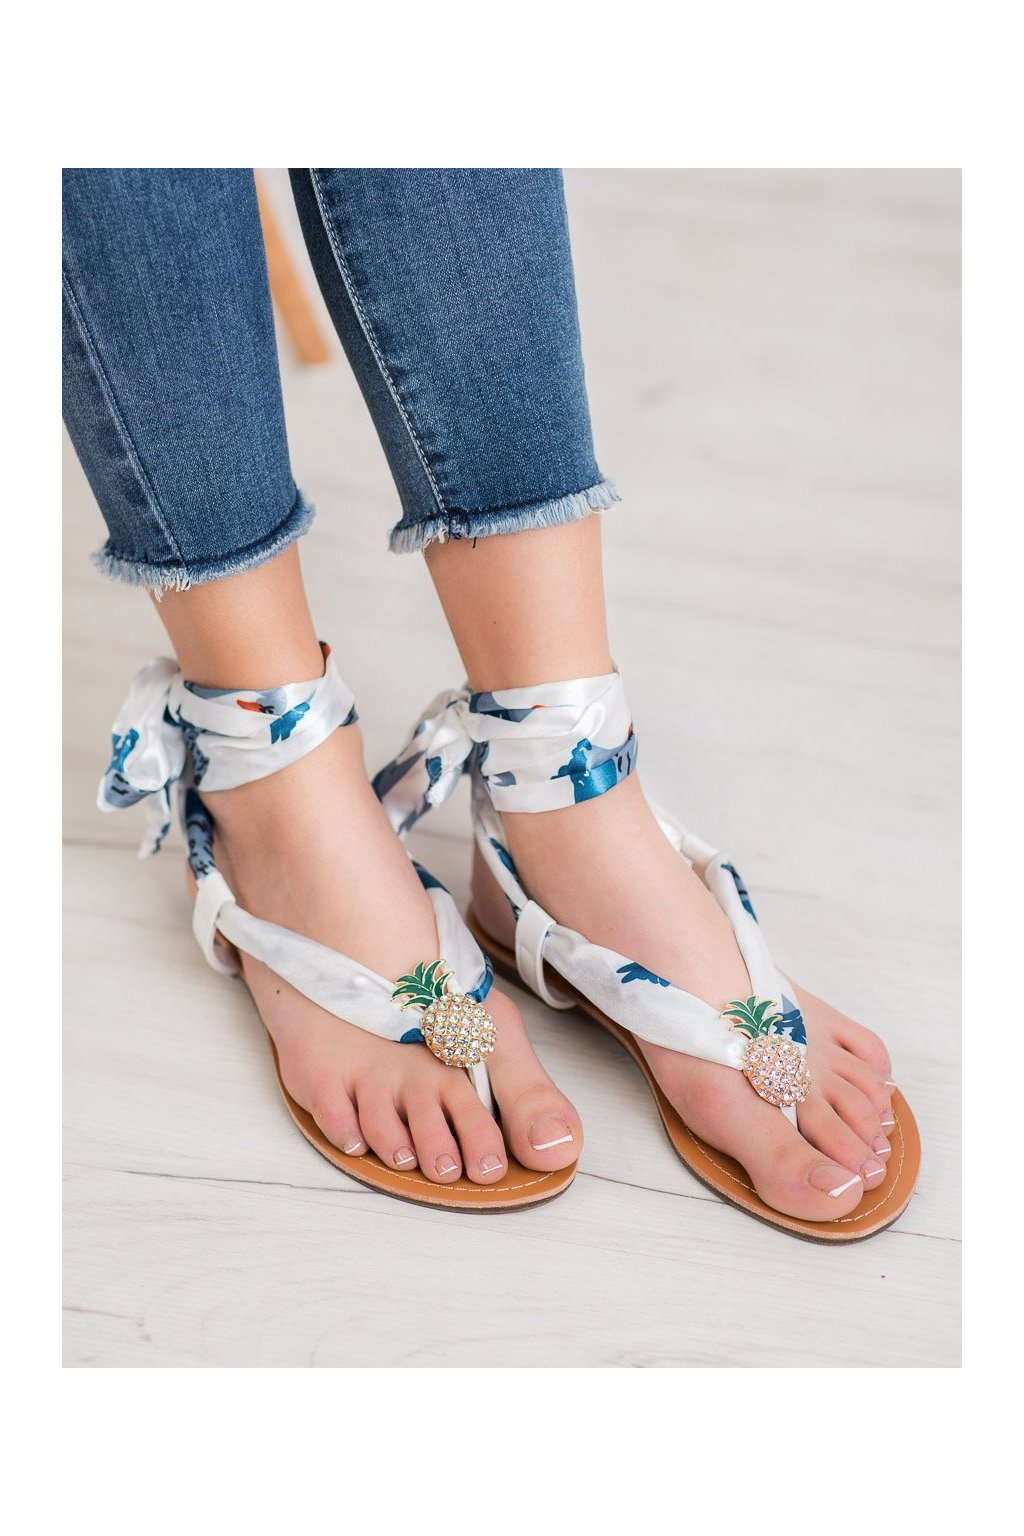 Biele sandále Shelovet kod PM12W